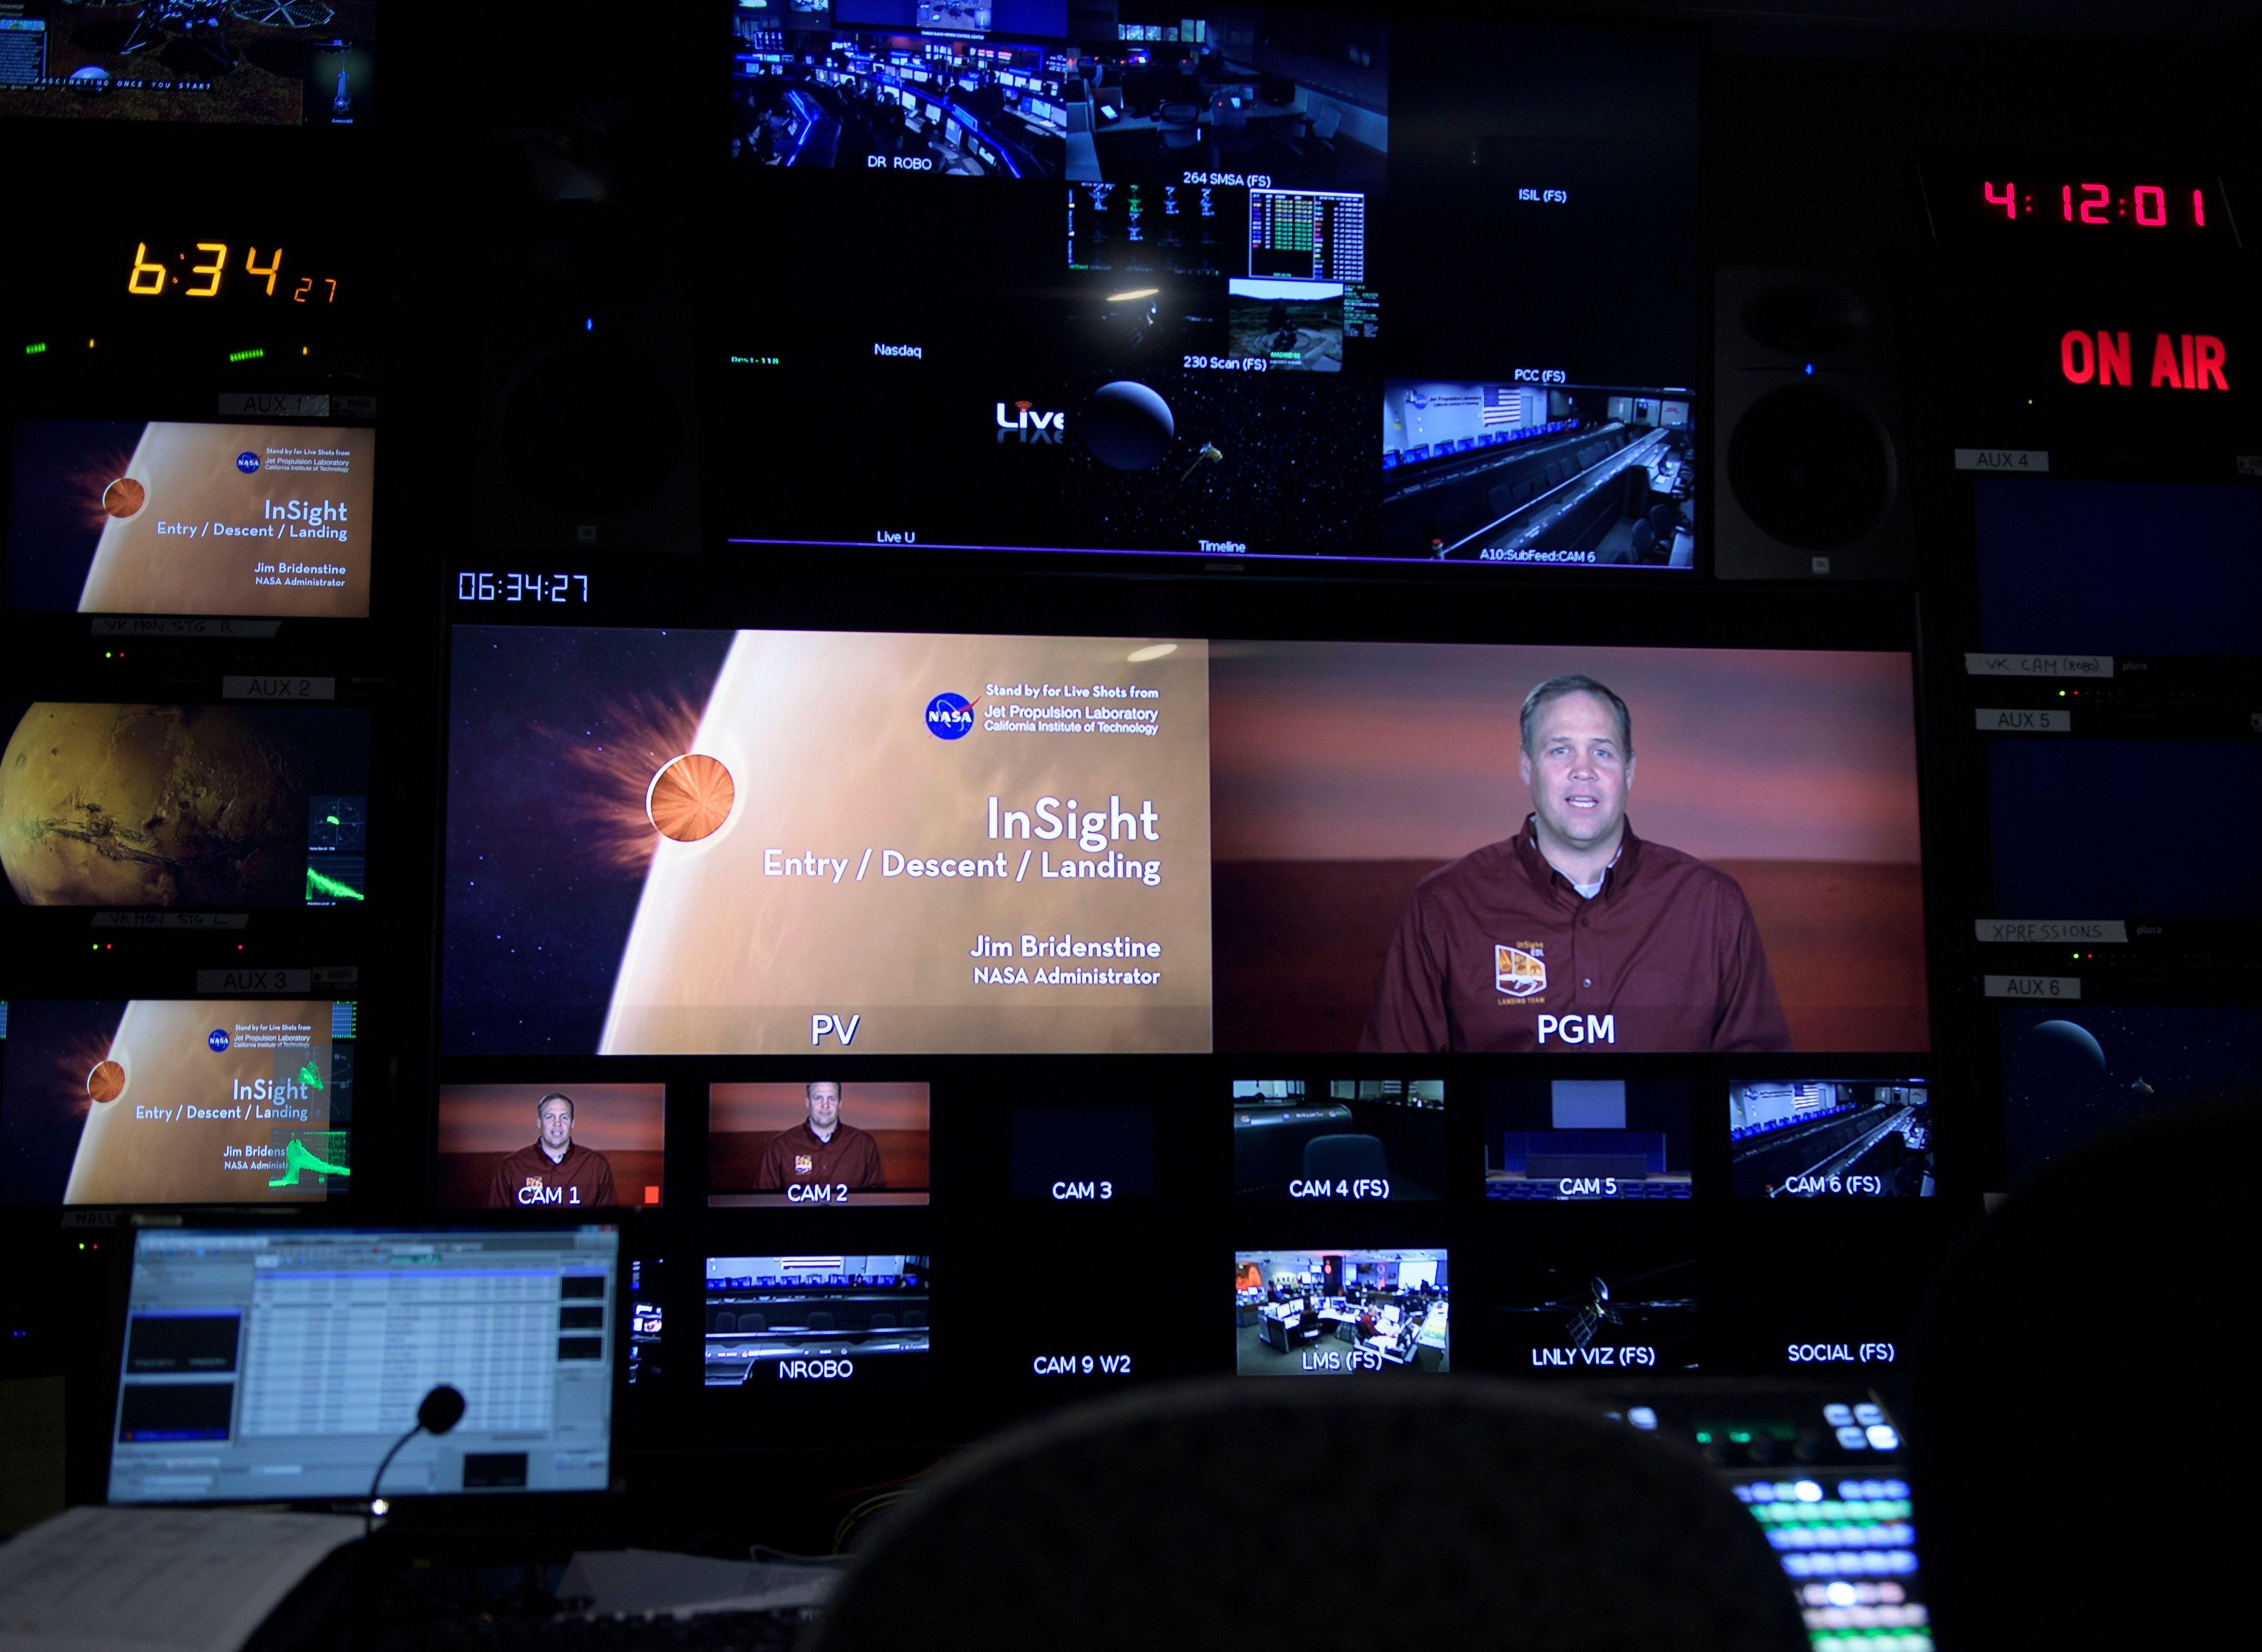 mars landing mission control live - photo #4